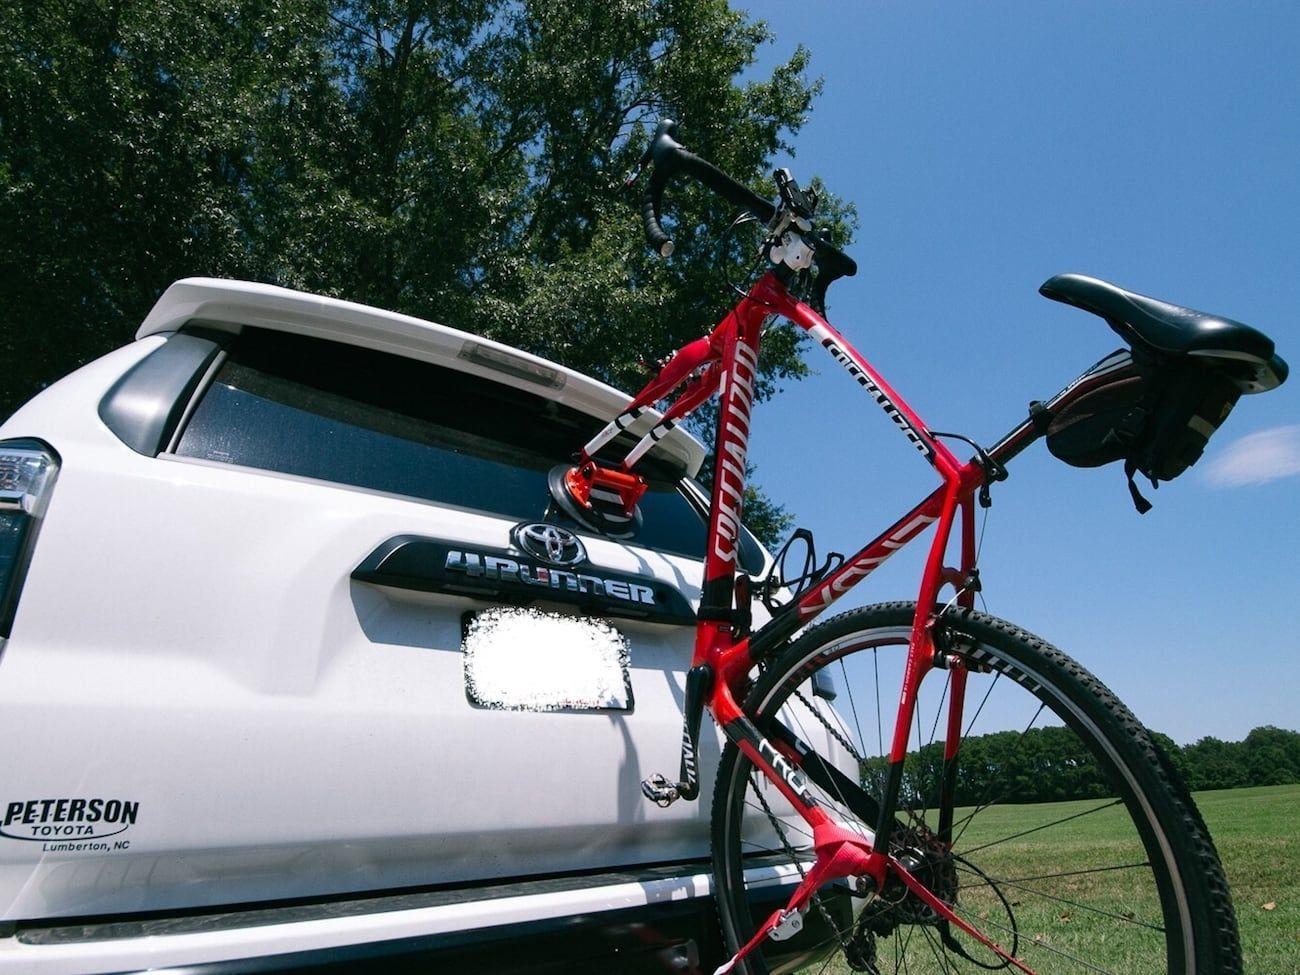 Kupper Mounts Next Generation Bike Rack With Images Bike Rack